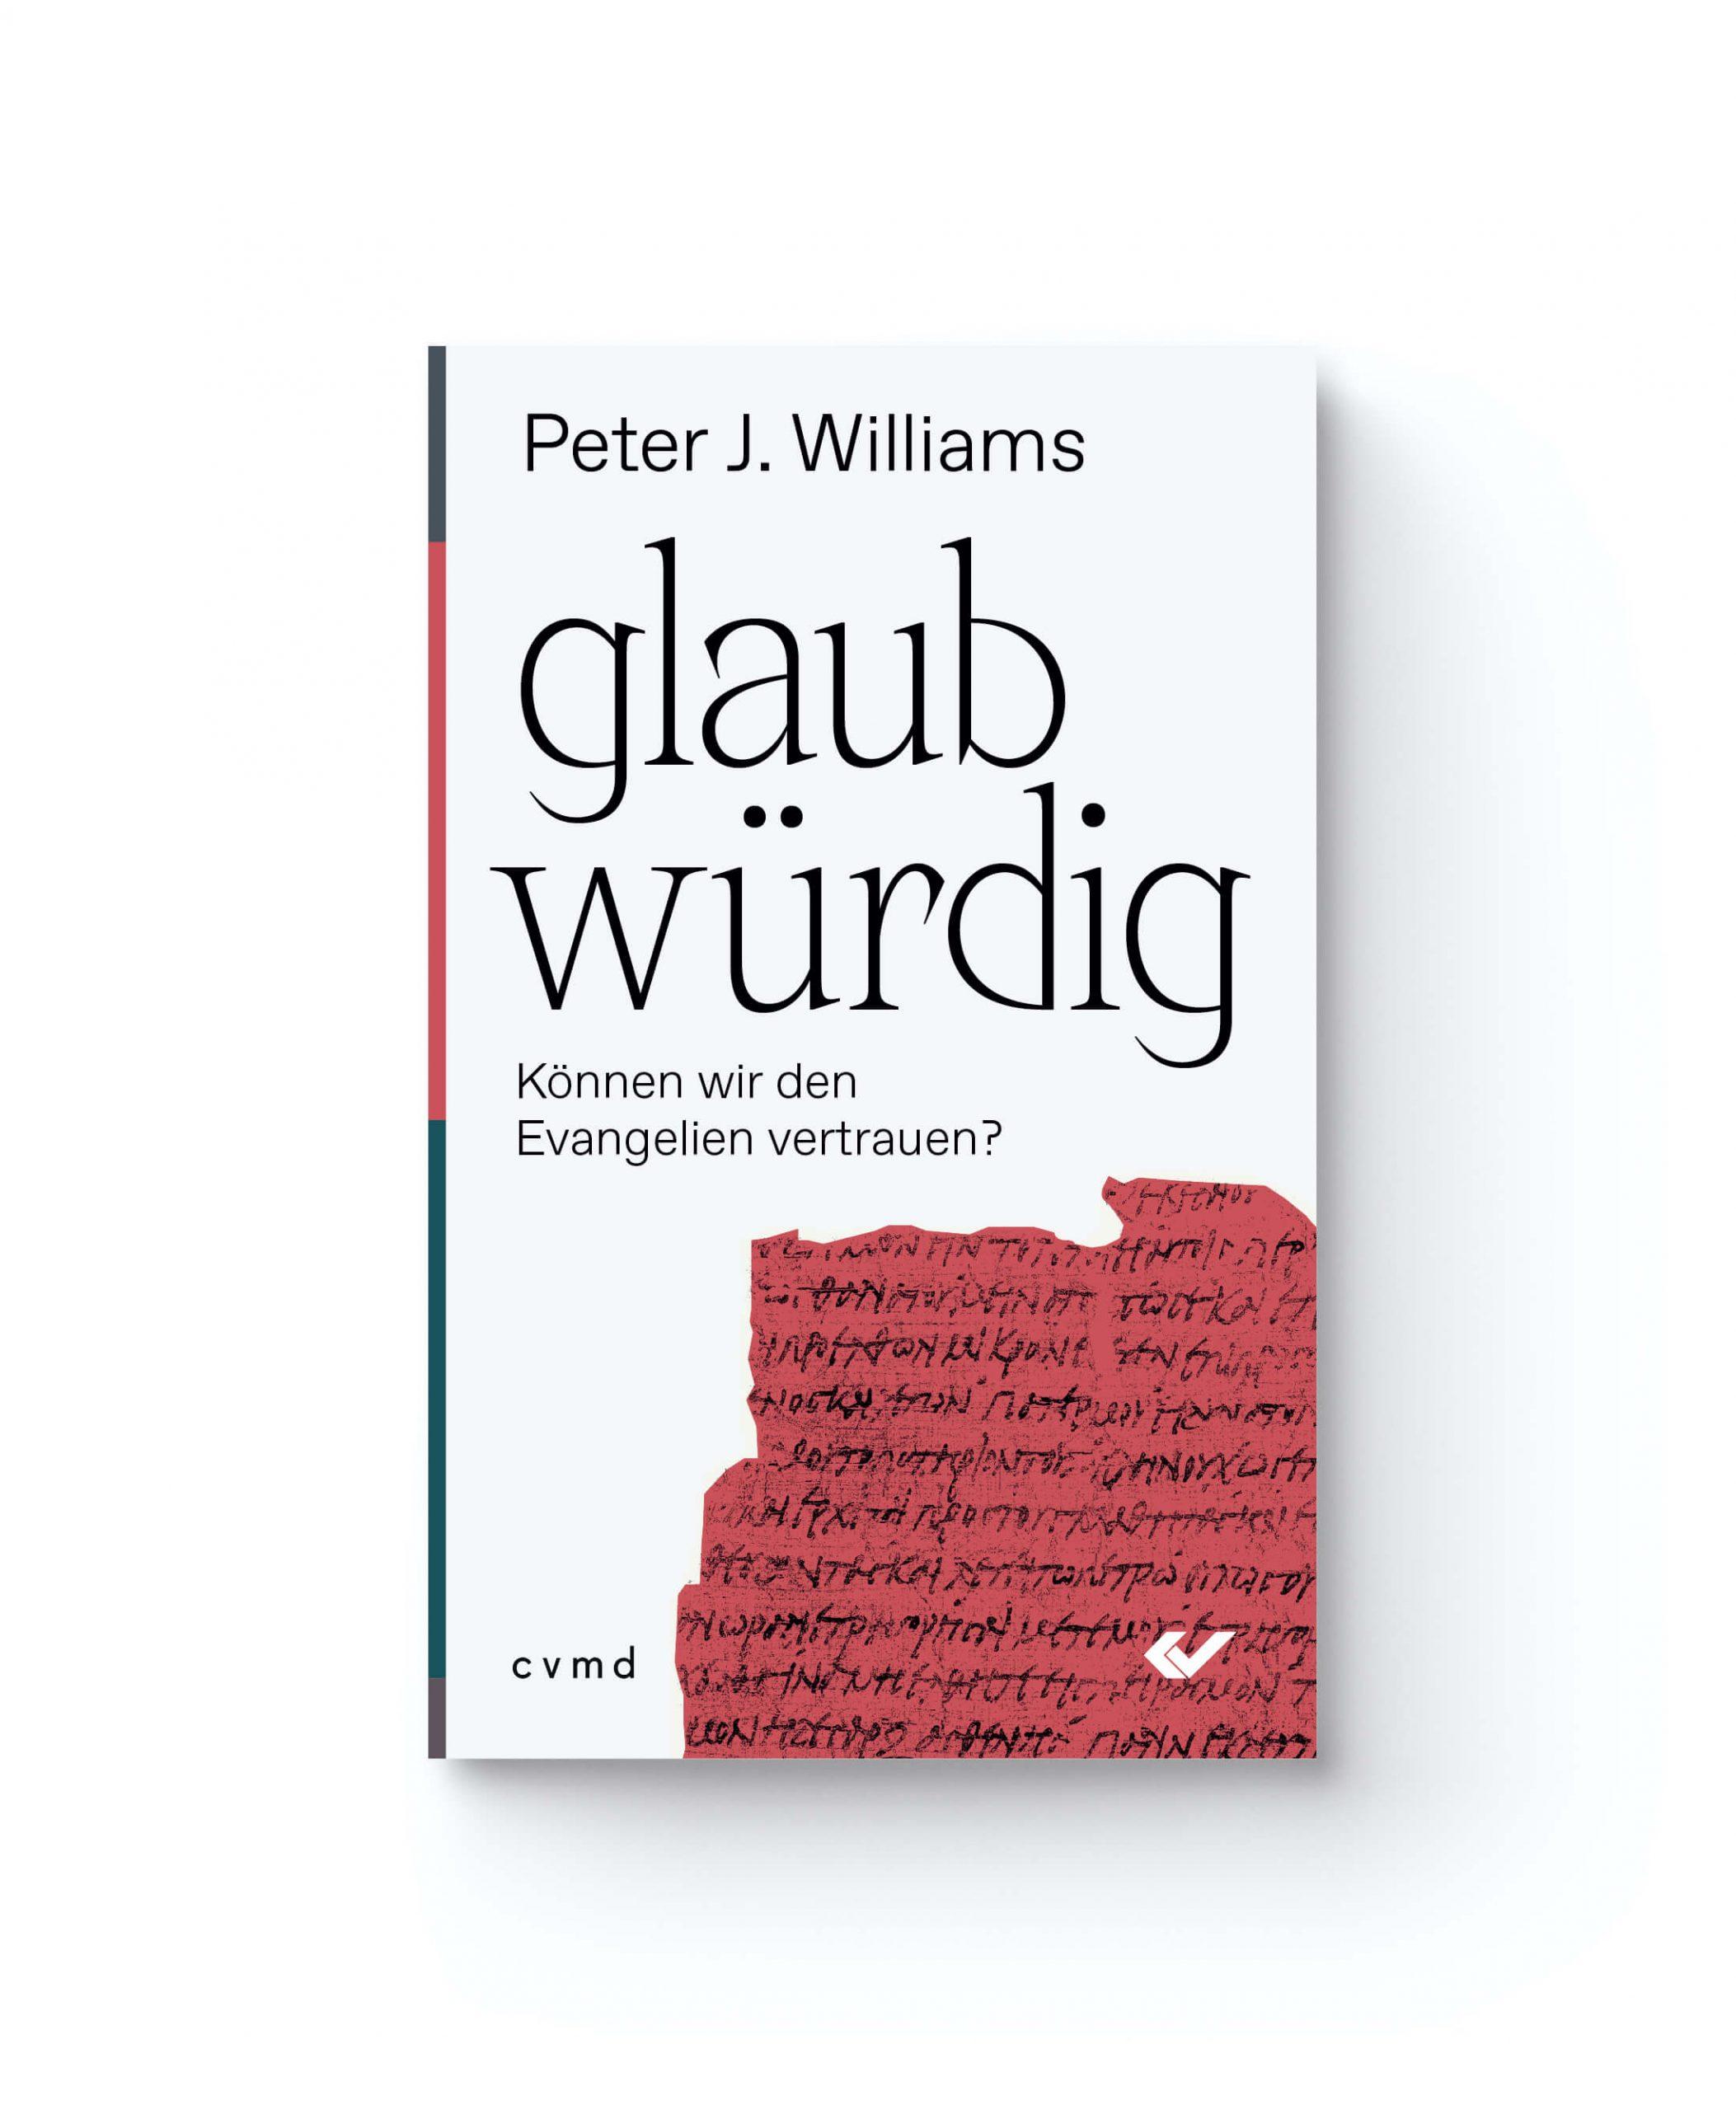 Peter Williams cvmd glaubwürdig Können wir den Evangelien vertrauen? Can We Trust the Gospels? Buch Apologetik Glaube Bibel